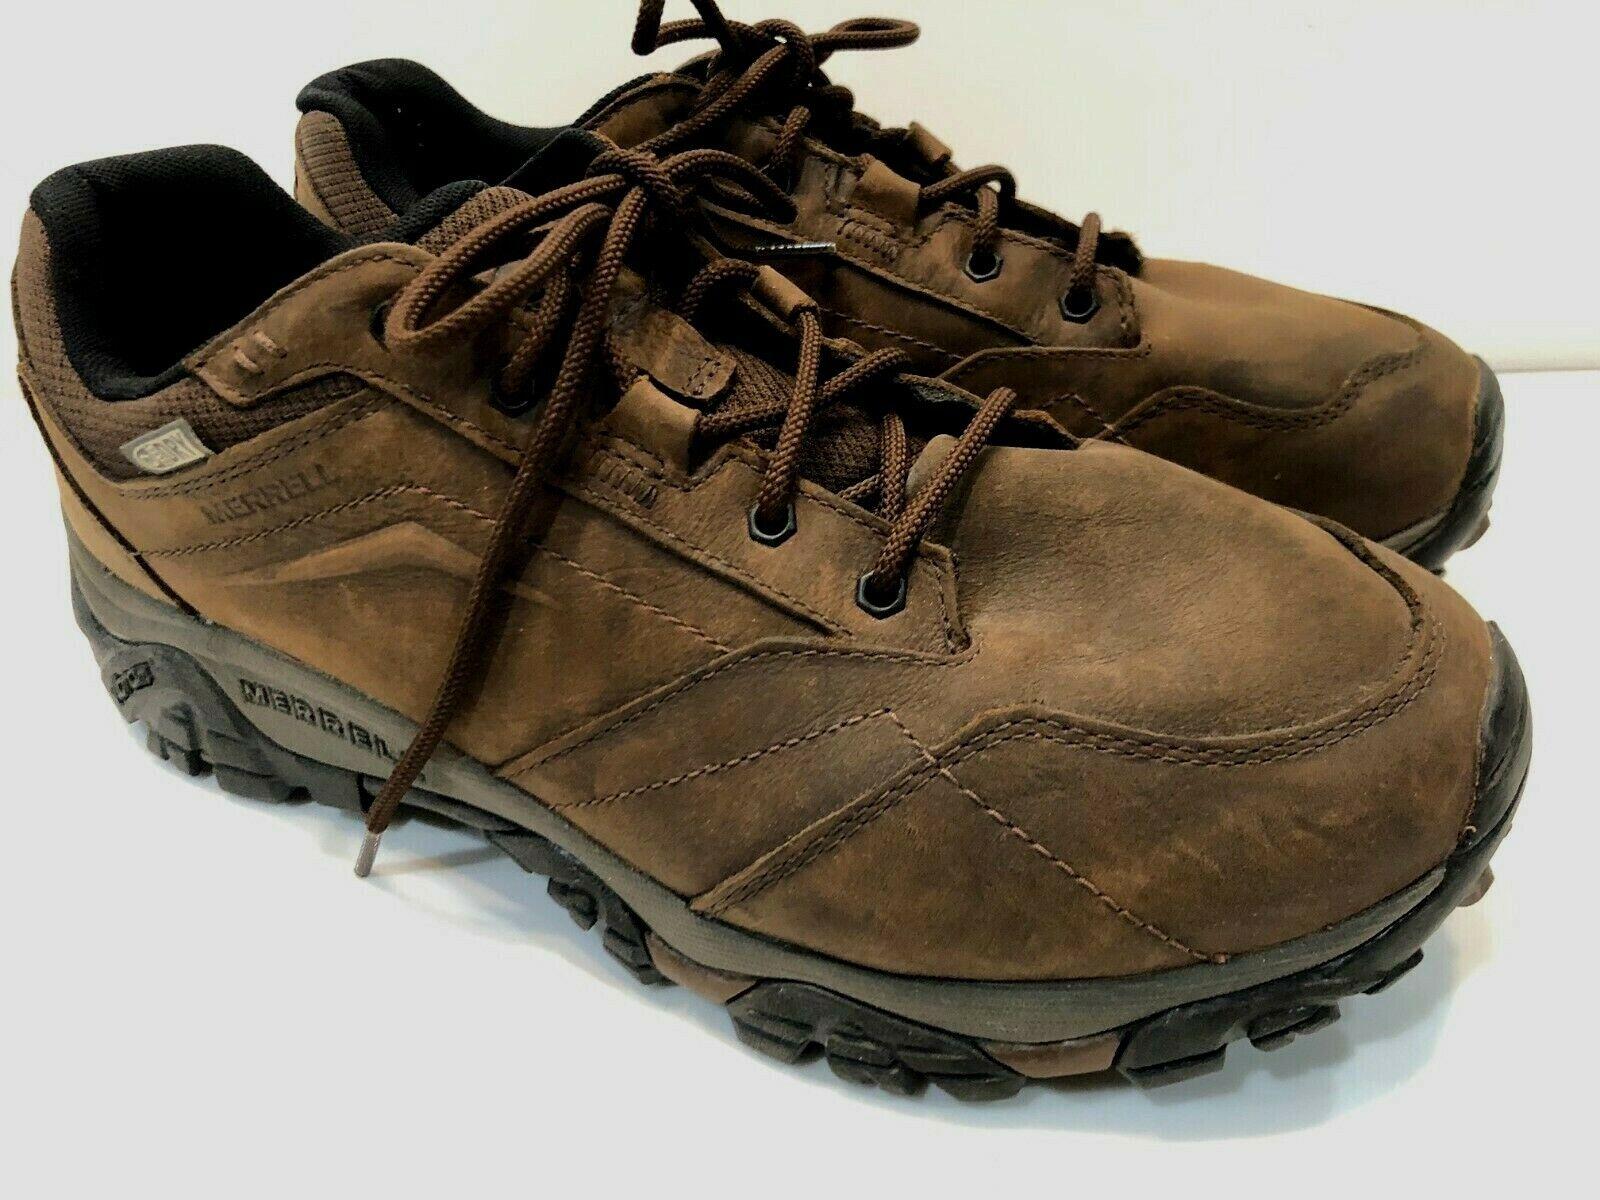 Merrell Moab Adventure Lace Waterproof Hiking shoes (Men's) in Dark Earth 11.5